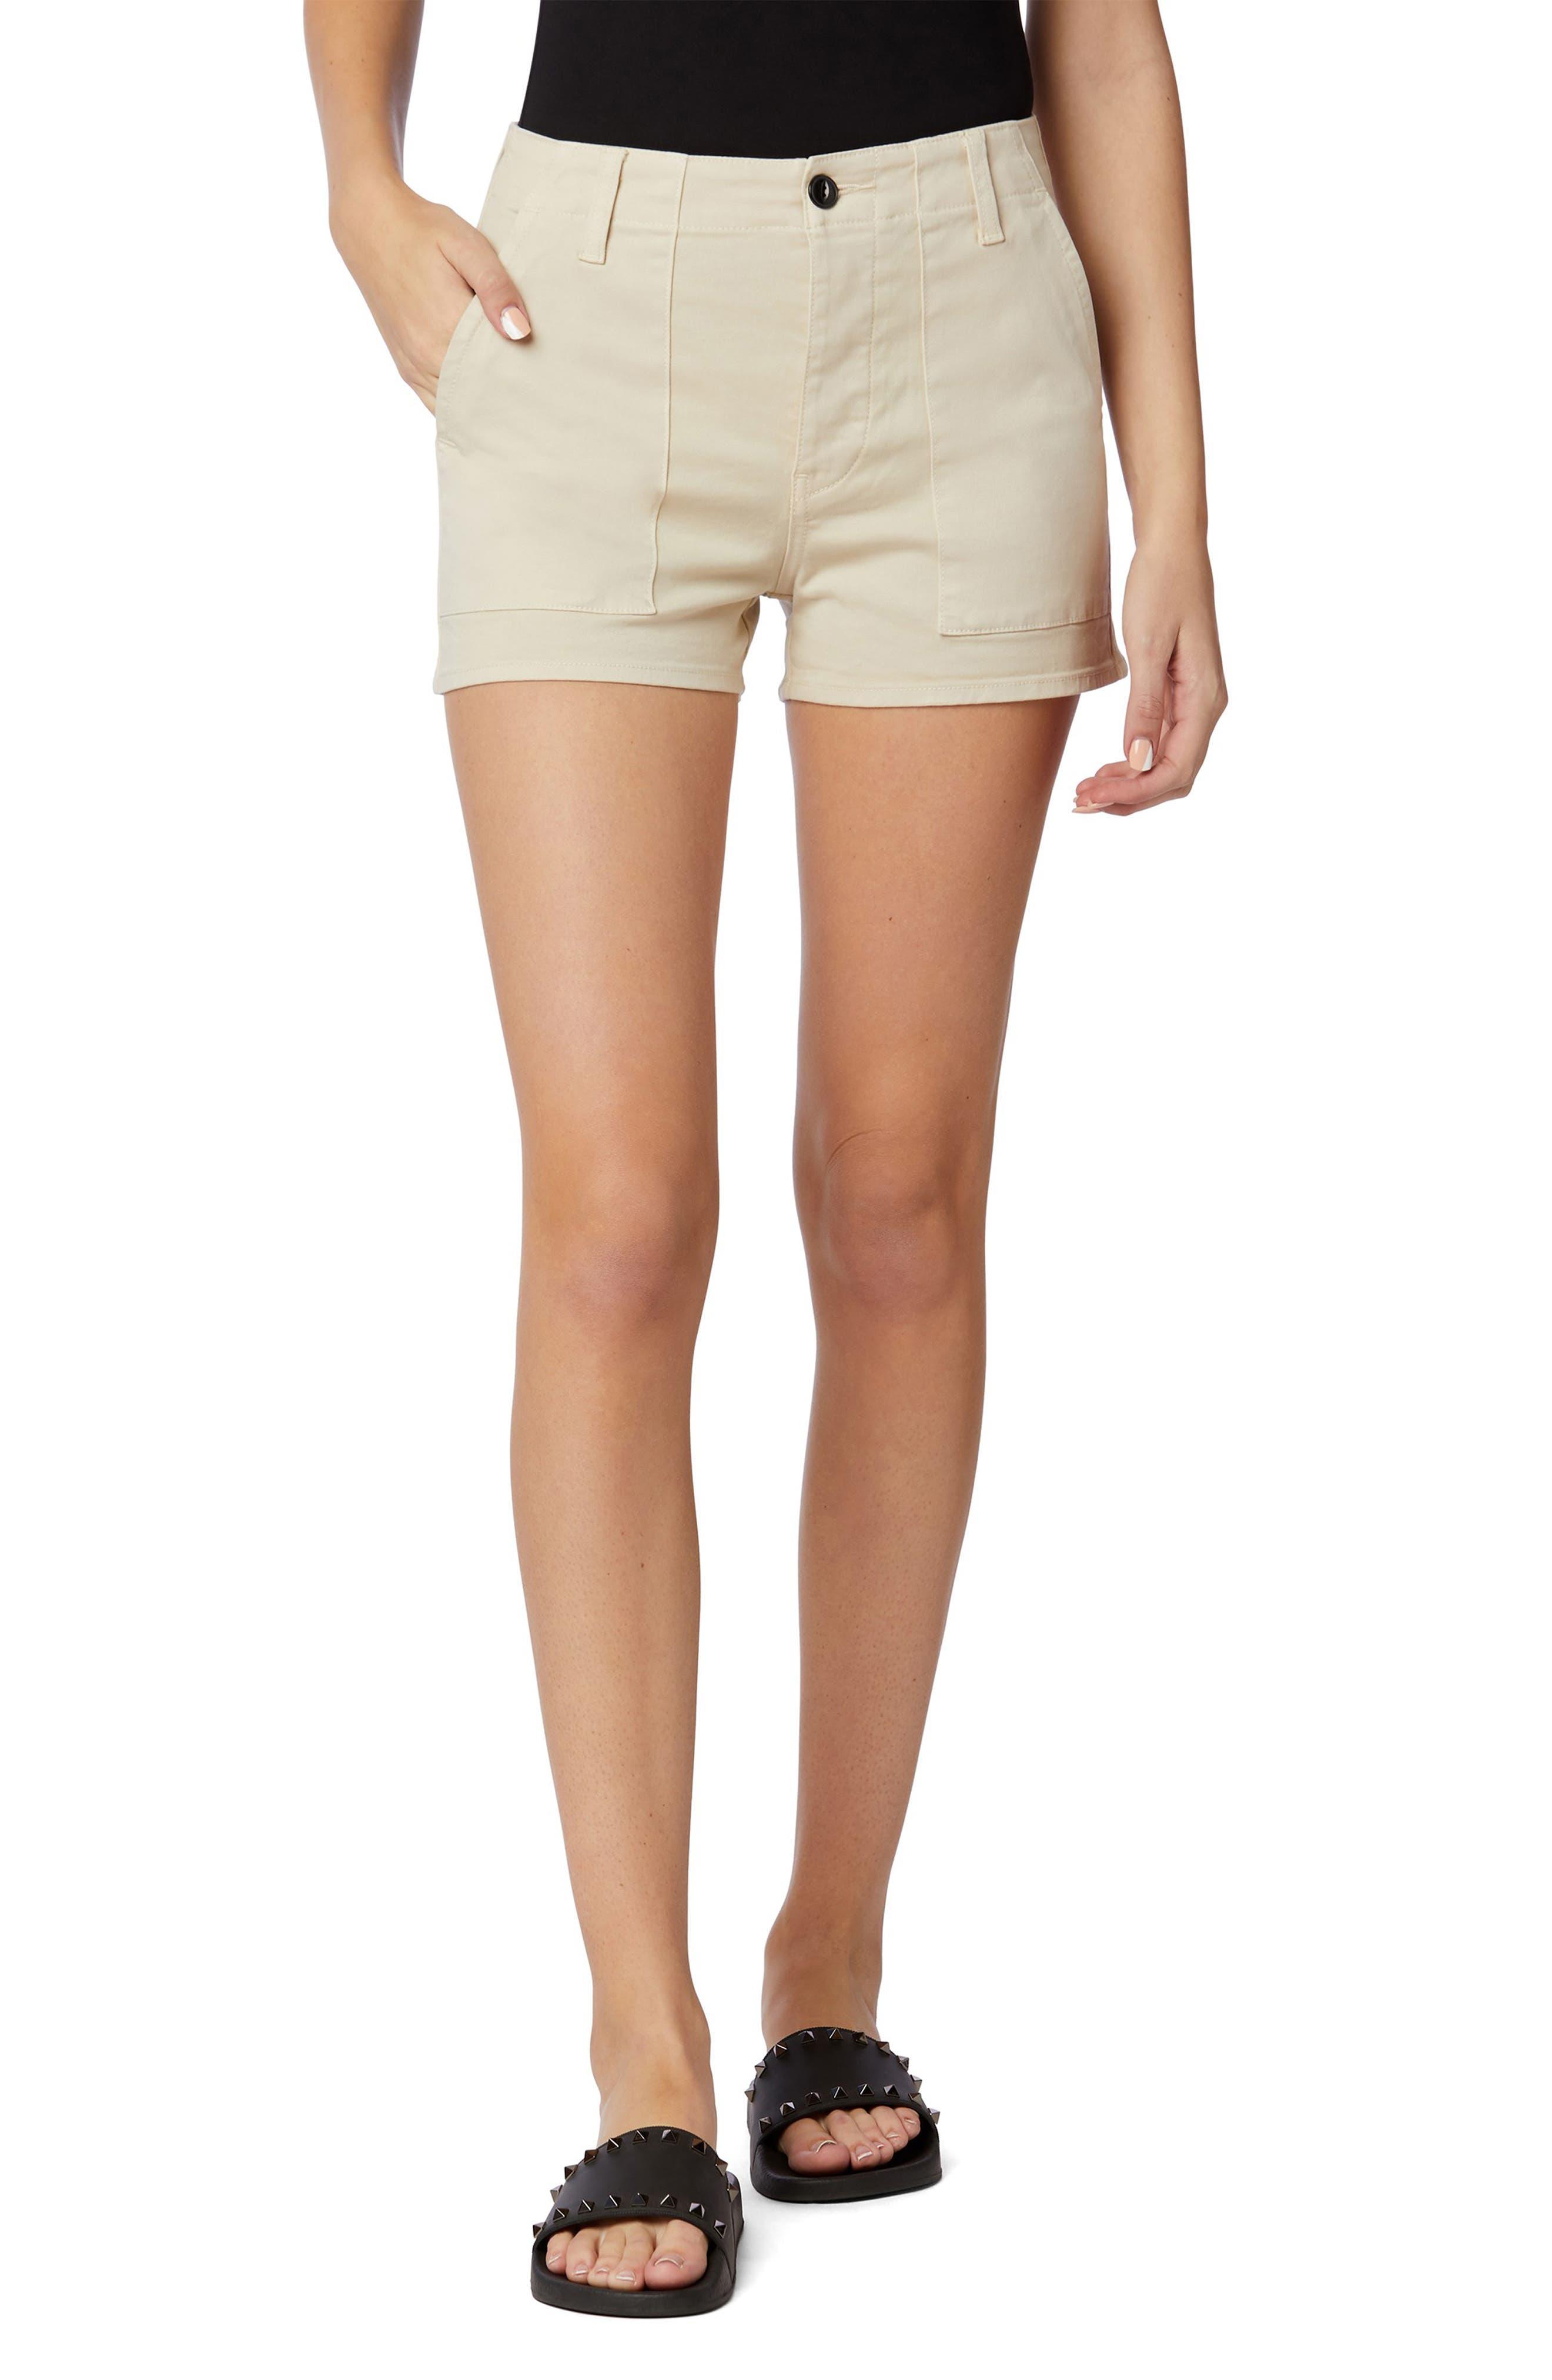 Military High Waist Cotton Blend Shorts